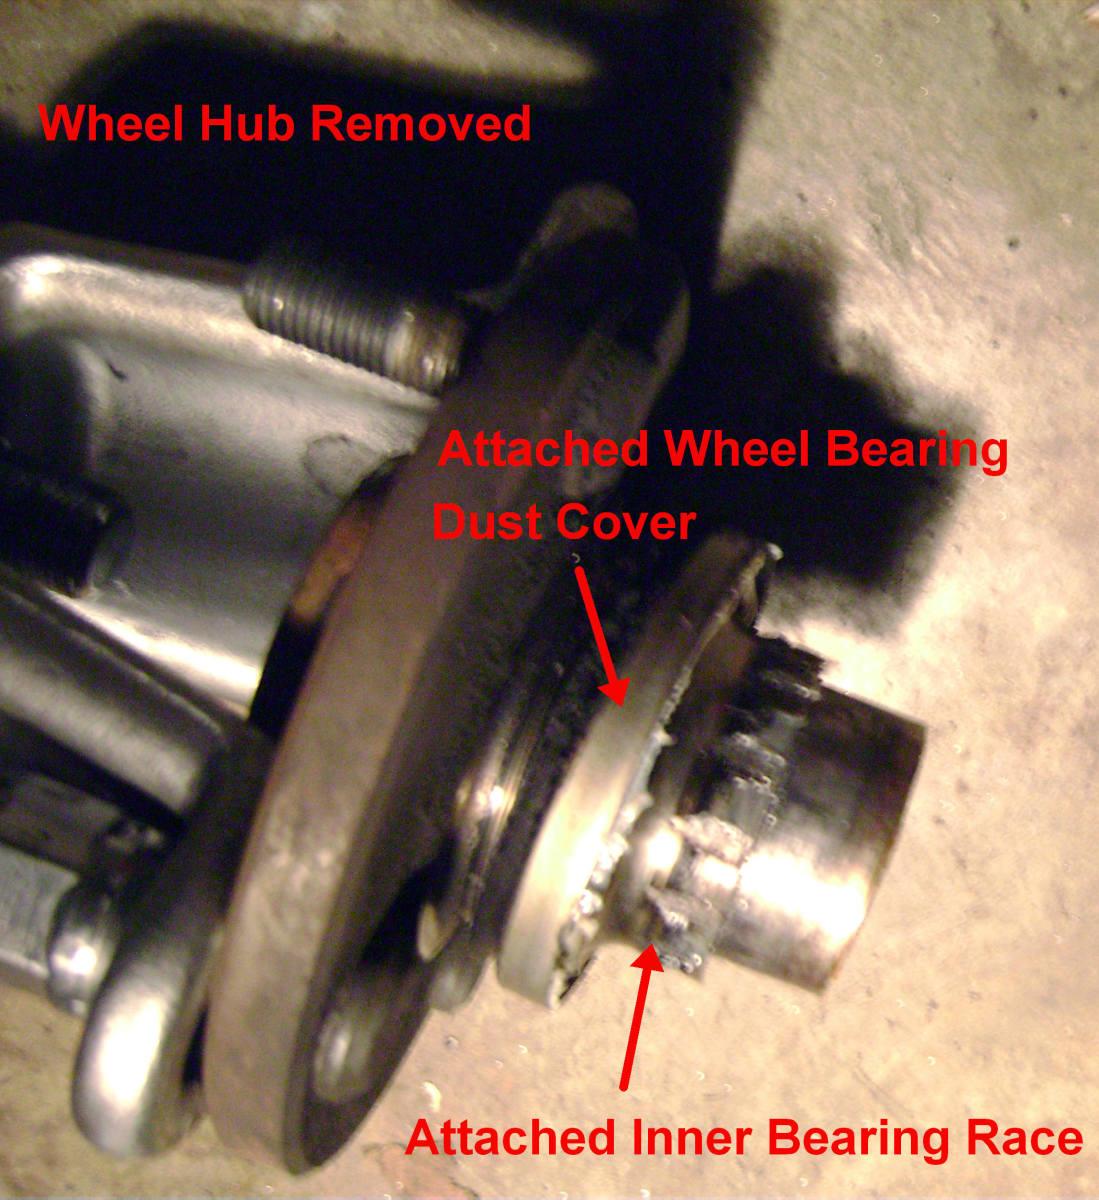 L.  Wheel hub removed